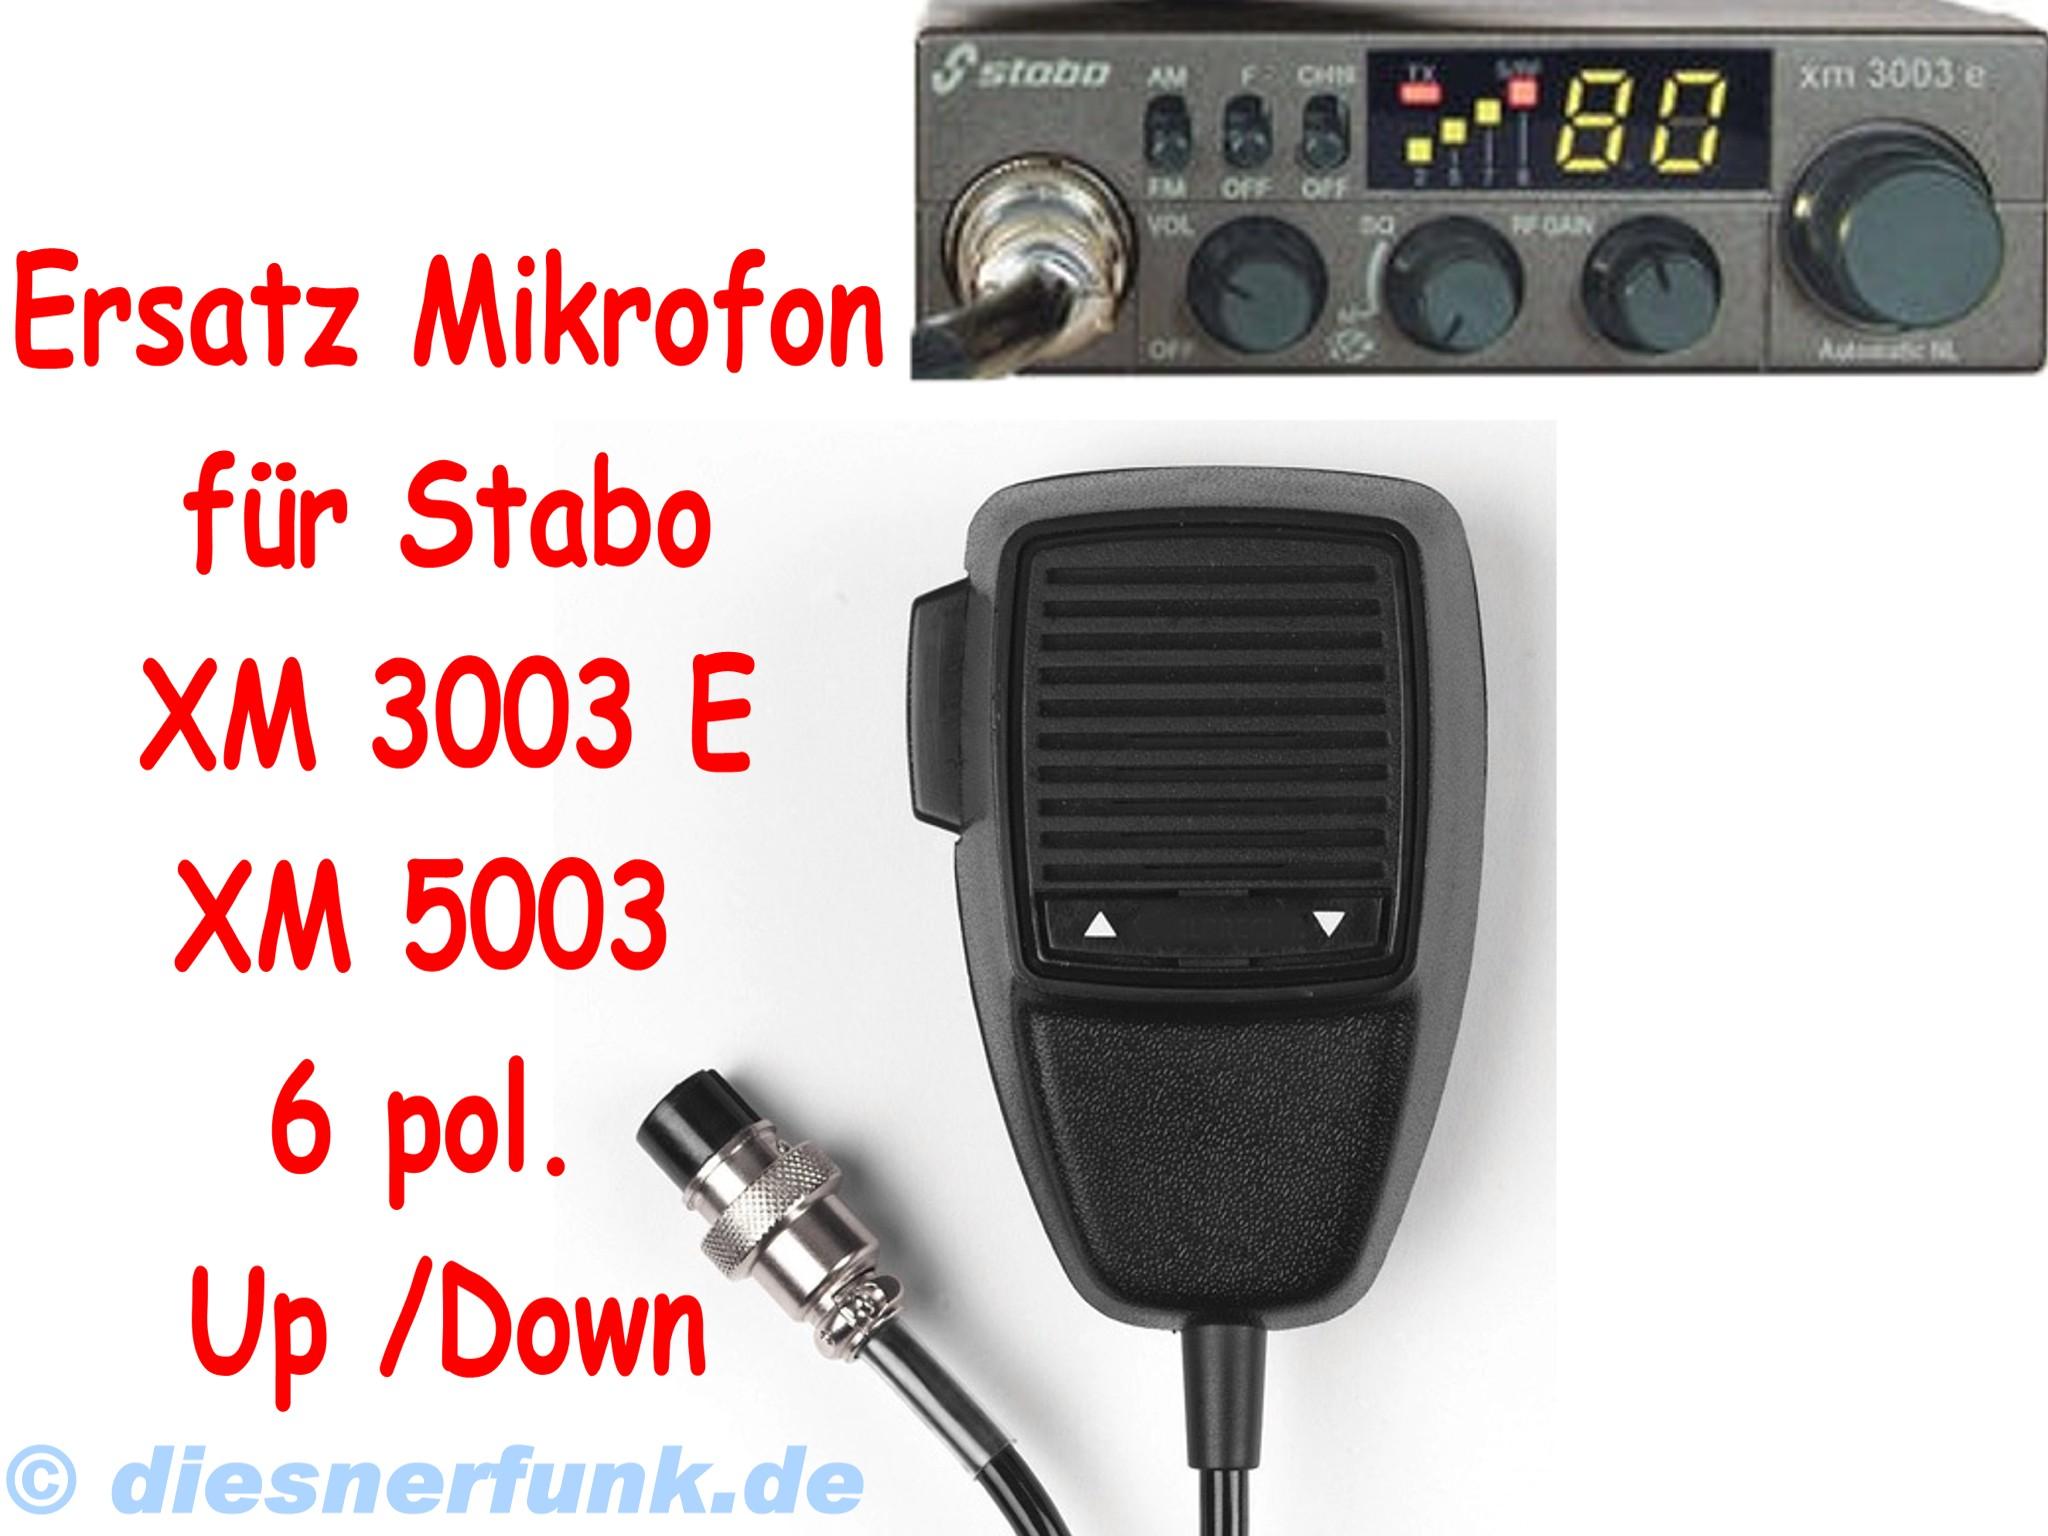 CB FUNK Ersatz Mikrofon für STABO XM 3003 XM3003E XM 5003 6pol ...